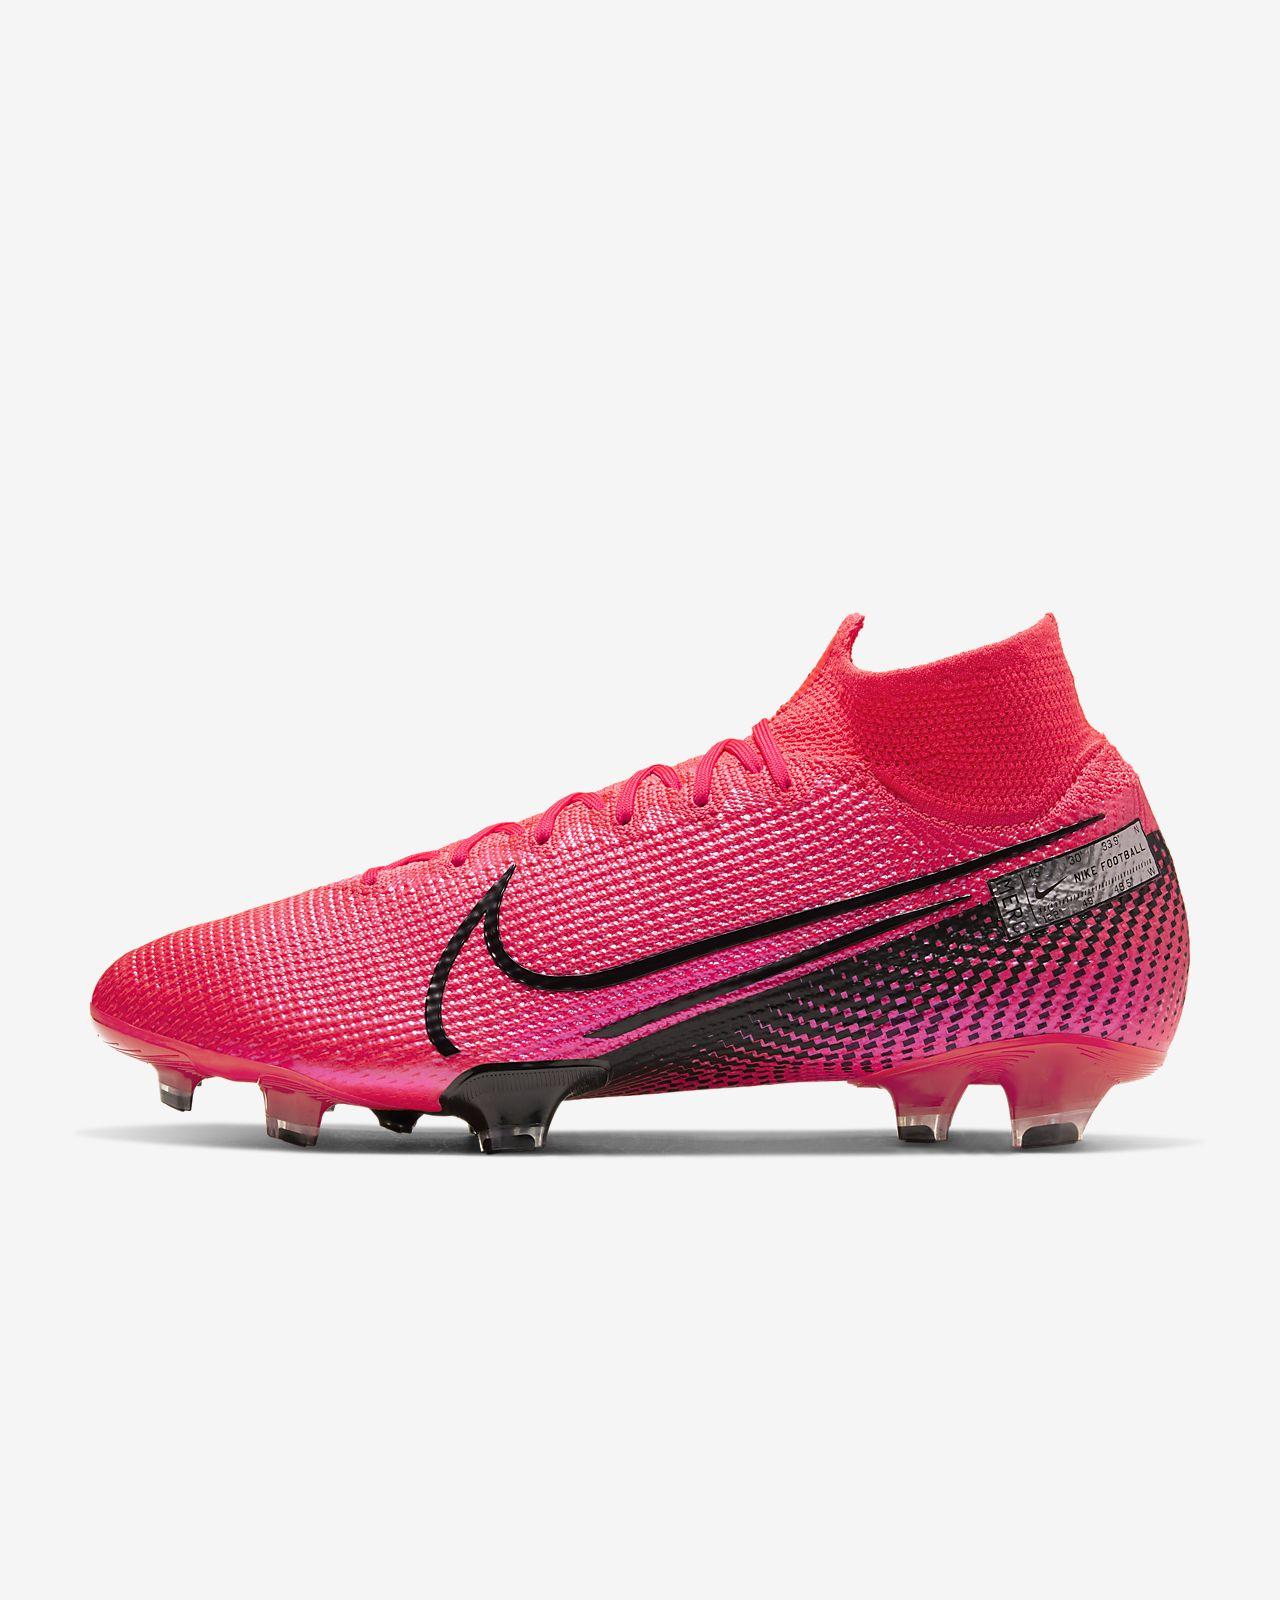 Nike Superfly 7 Elite FG 男/女天然硬质草地足球鞋